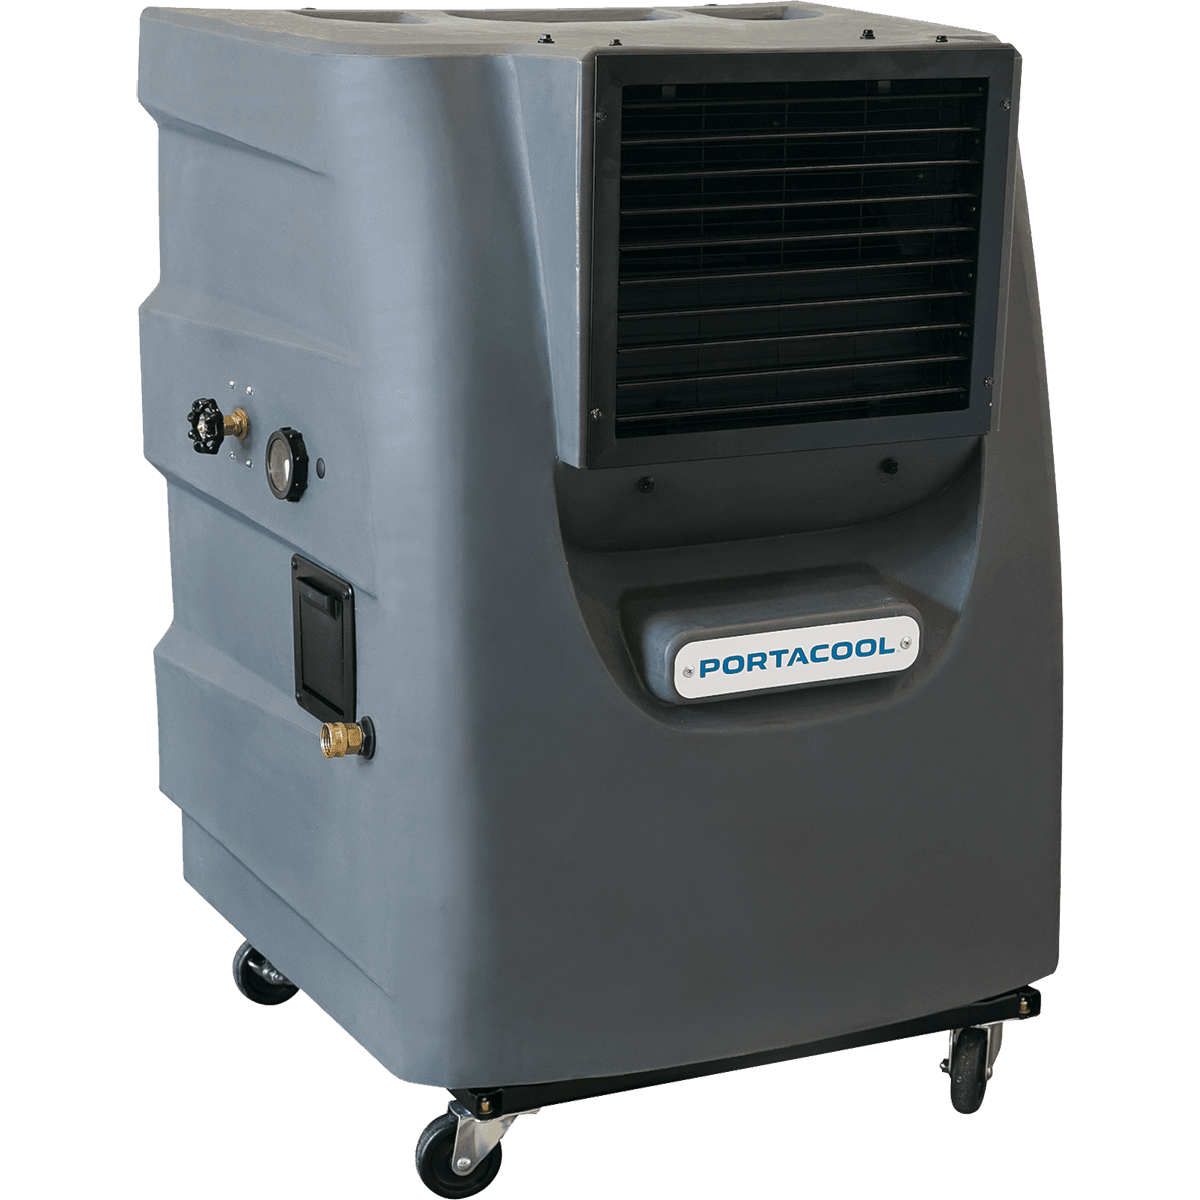 Swamp Cooler Media : Portacool cyclone portable evaporative cooler sylvane